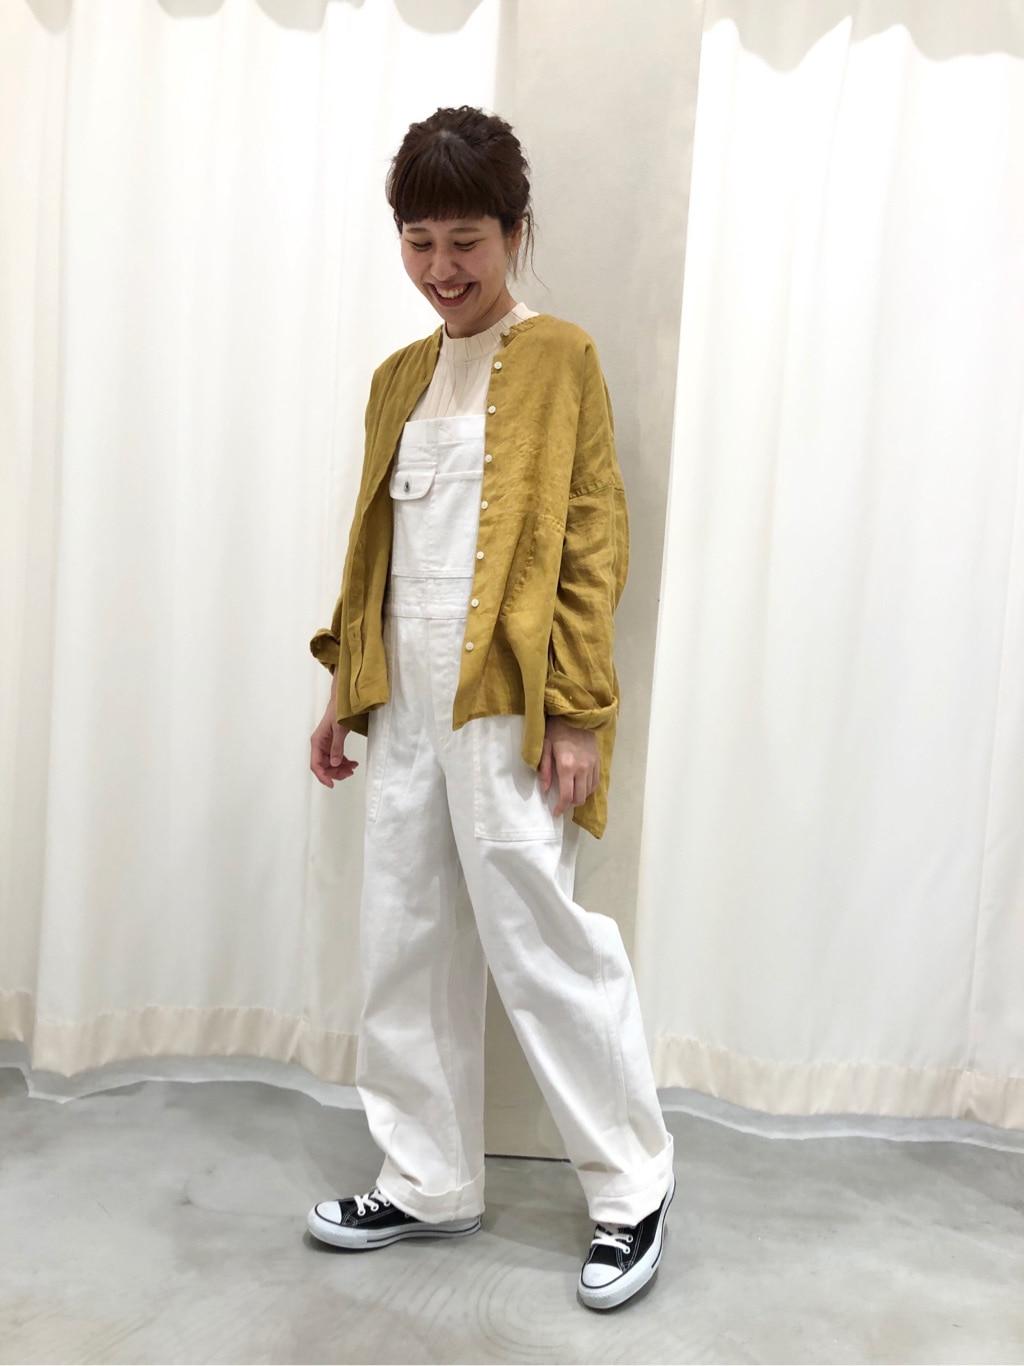 AMB SHOP CHILD WOMAN CHILD WOMAN , PAR ICI 東京スカイツリータウン・ソラマチ 身長:160cm 2020.06.20